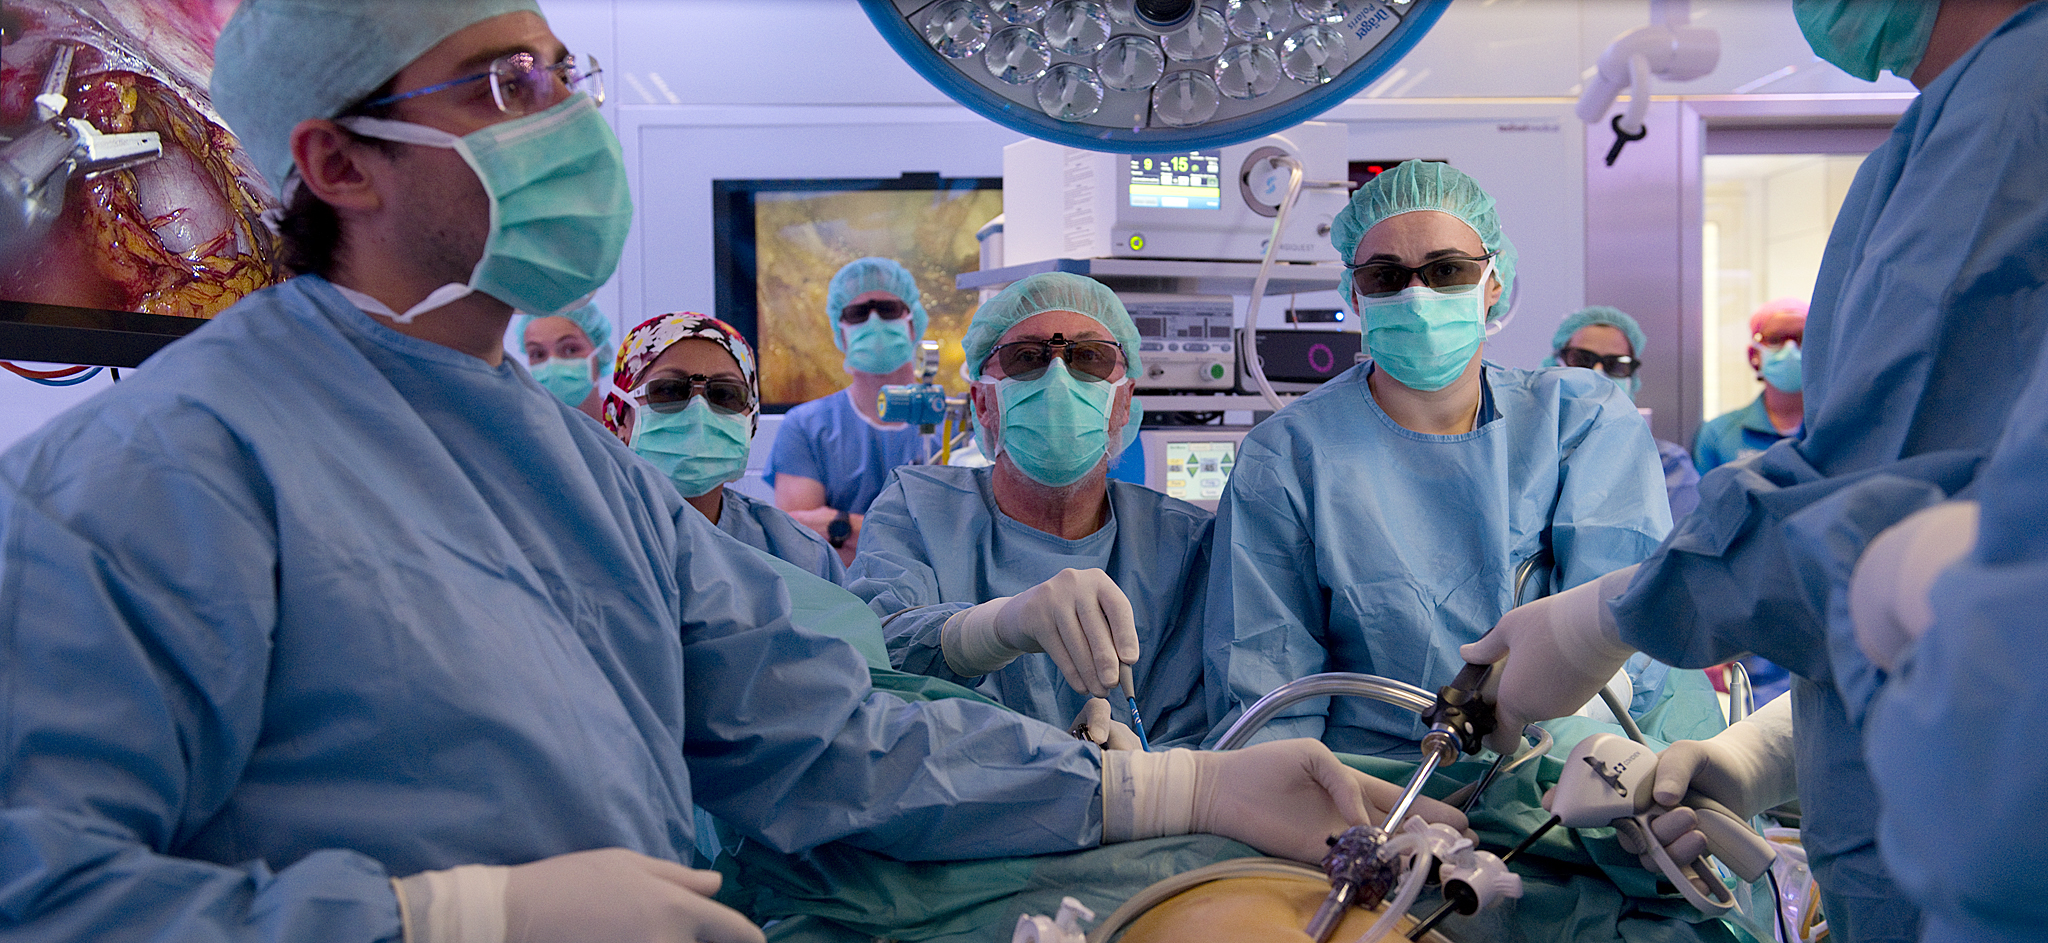 Cancer de prostata operacion consecuencias - Apariția viermilor